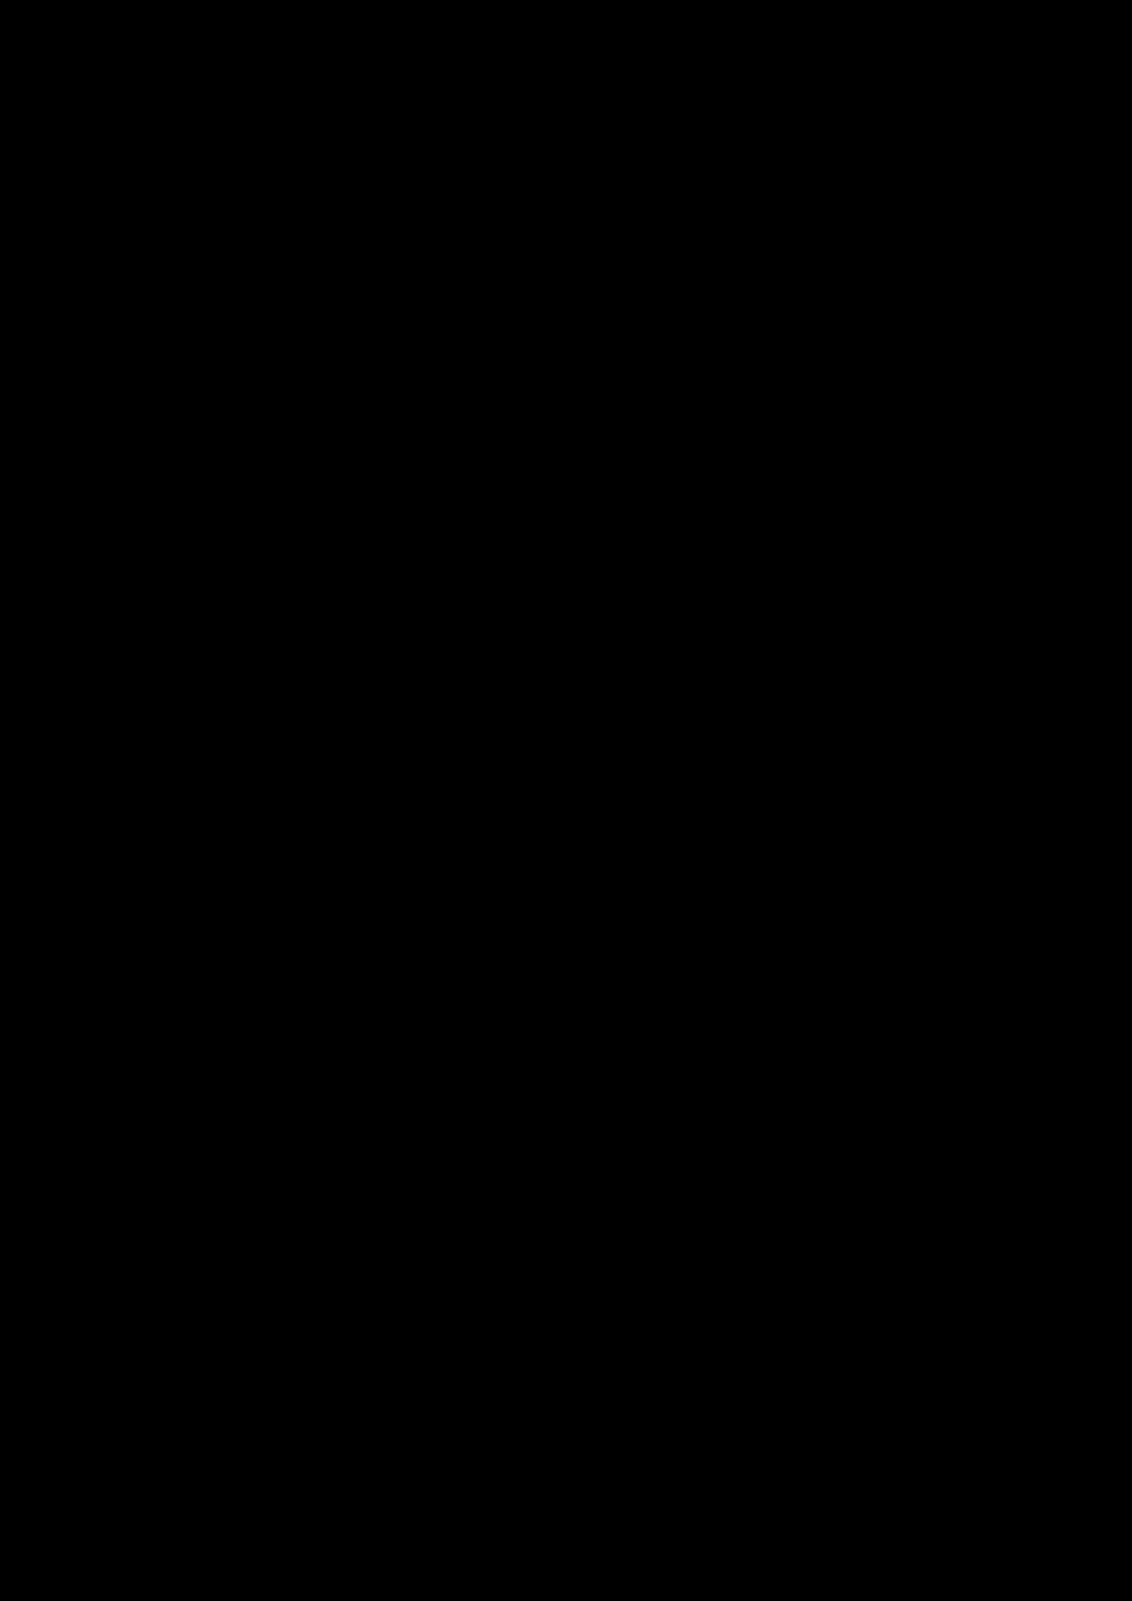 Korolevstvo slez slide, Image 52